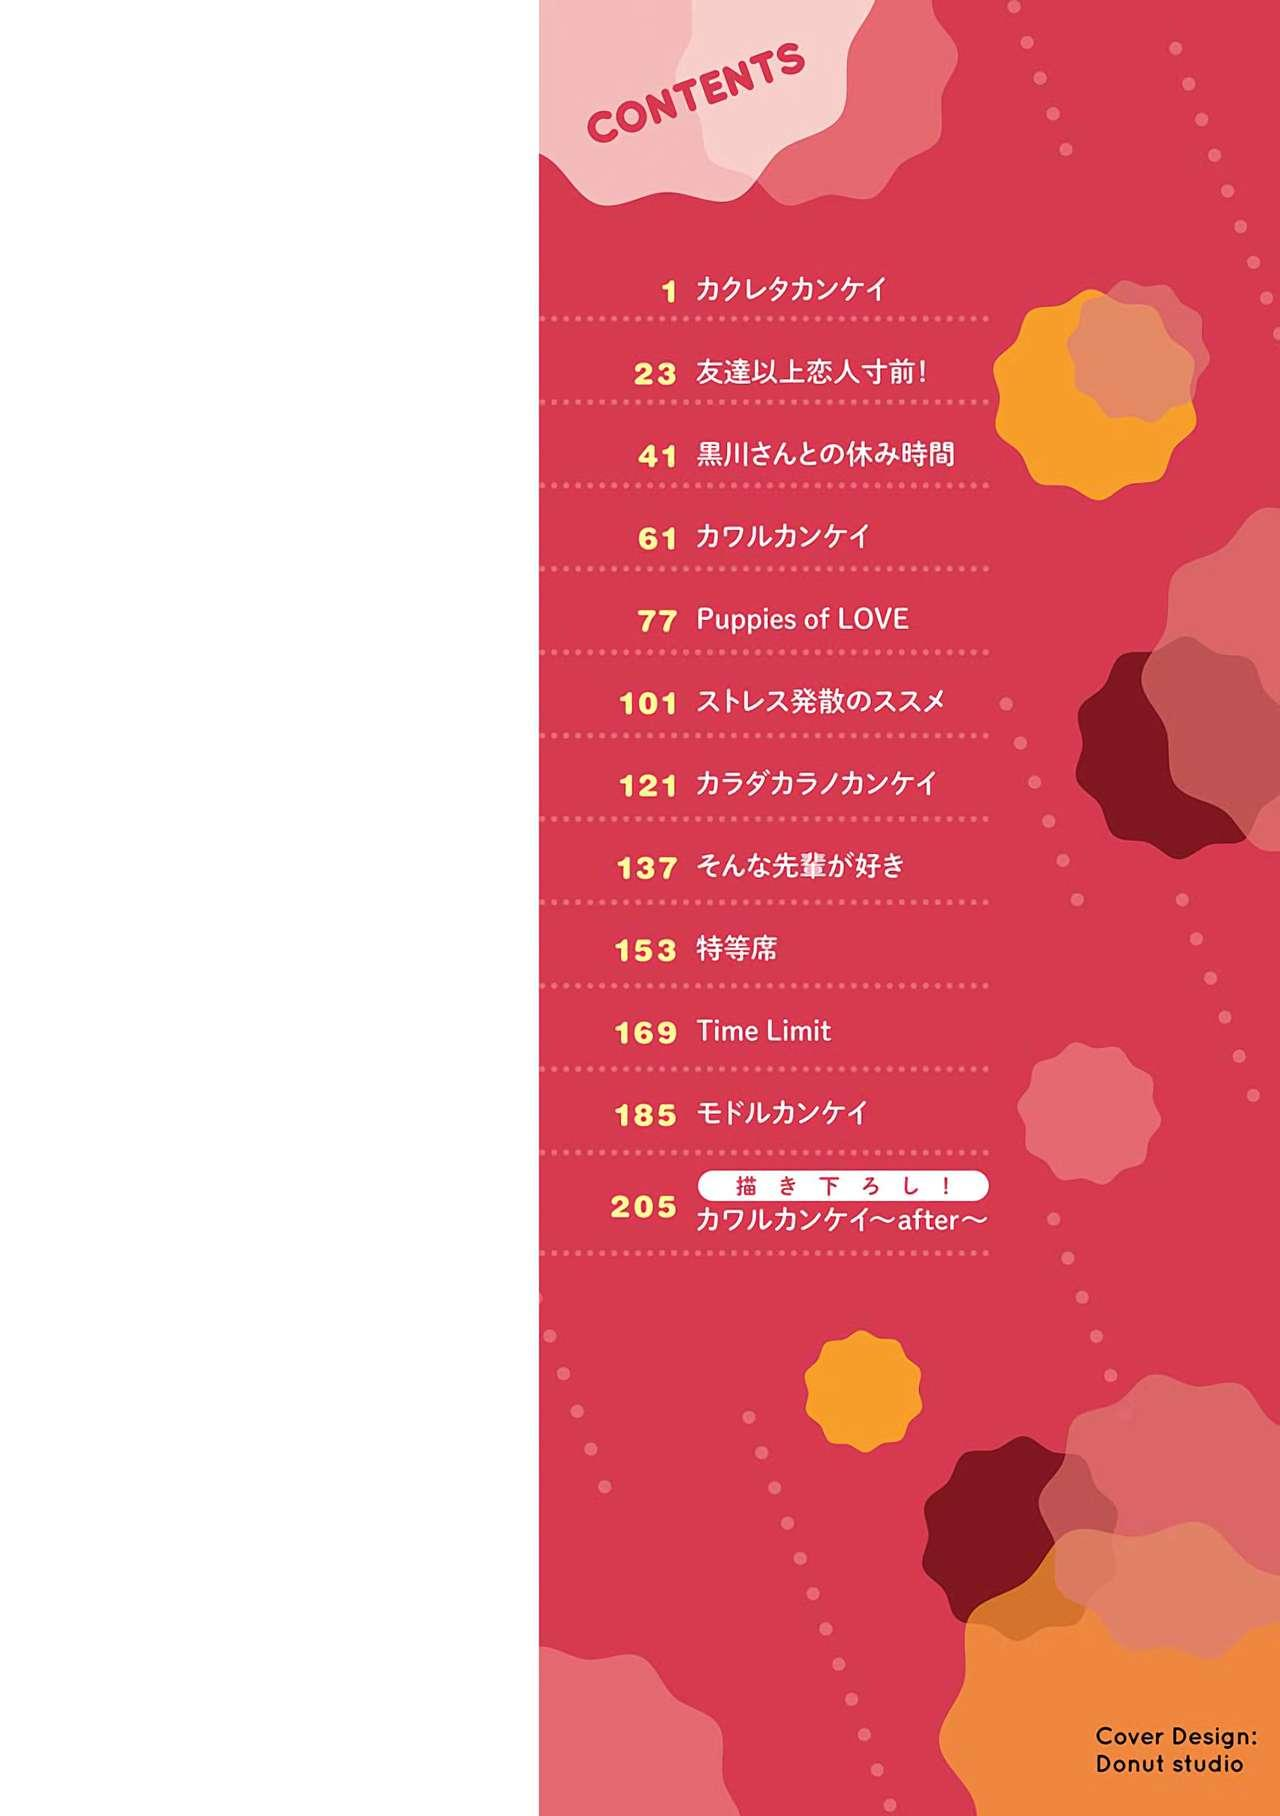 [Saemon] Ironna Kankei - Iro-Ero relationship Ch. 1-2, 4, 6, 8, 10, 12 [English] [N04h] [Digital] 1